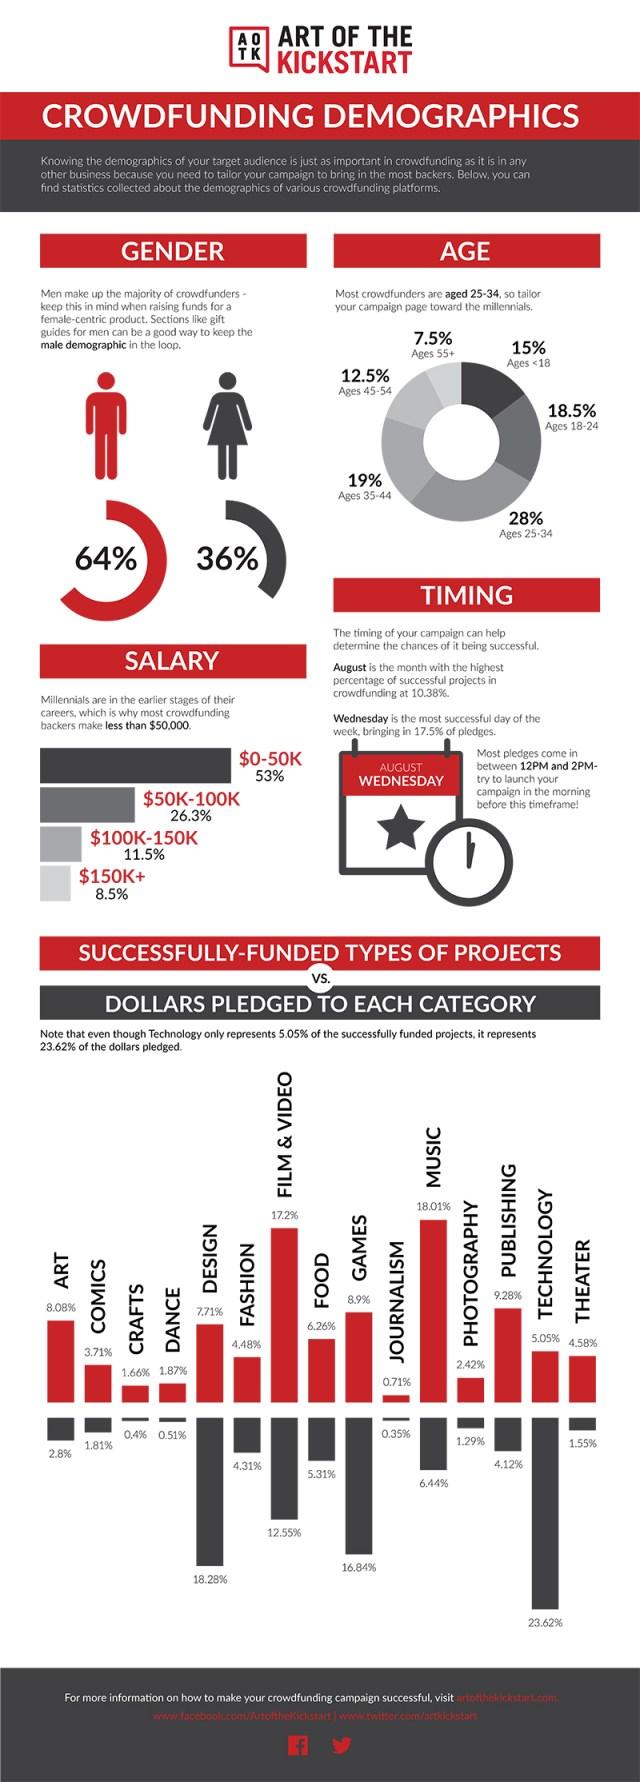 Crowdfunding Demographics Infographic